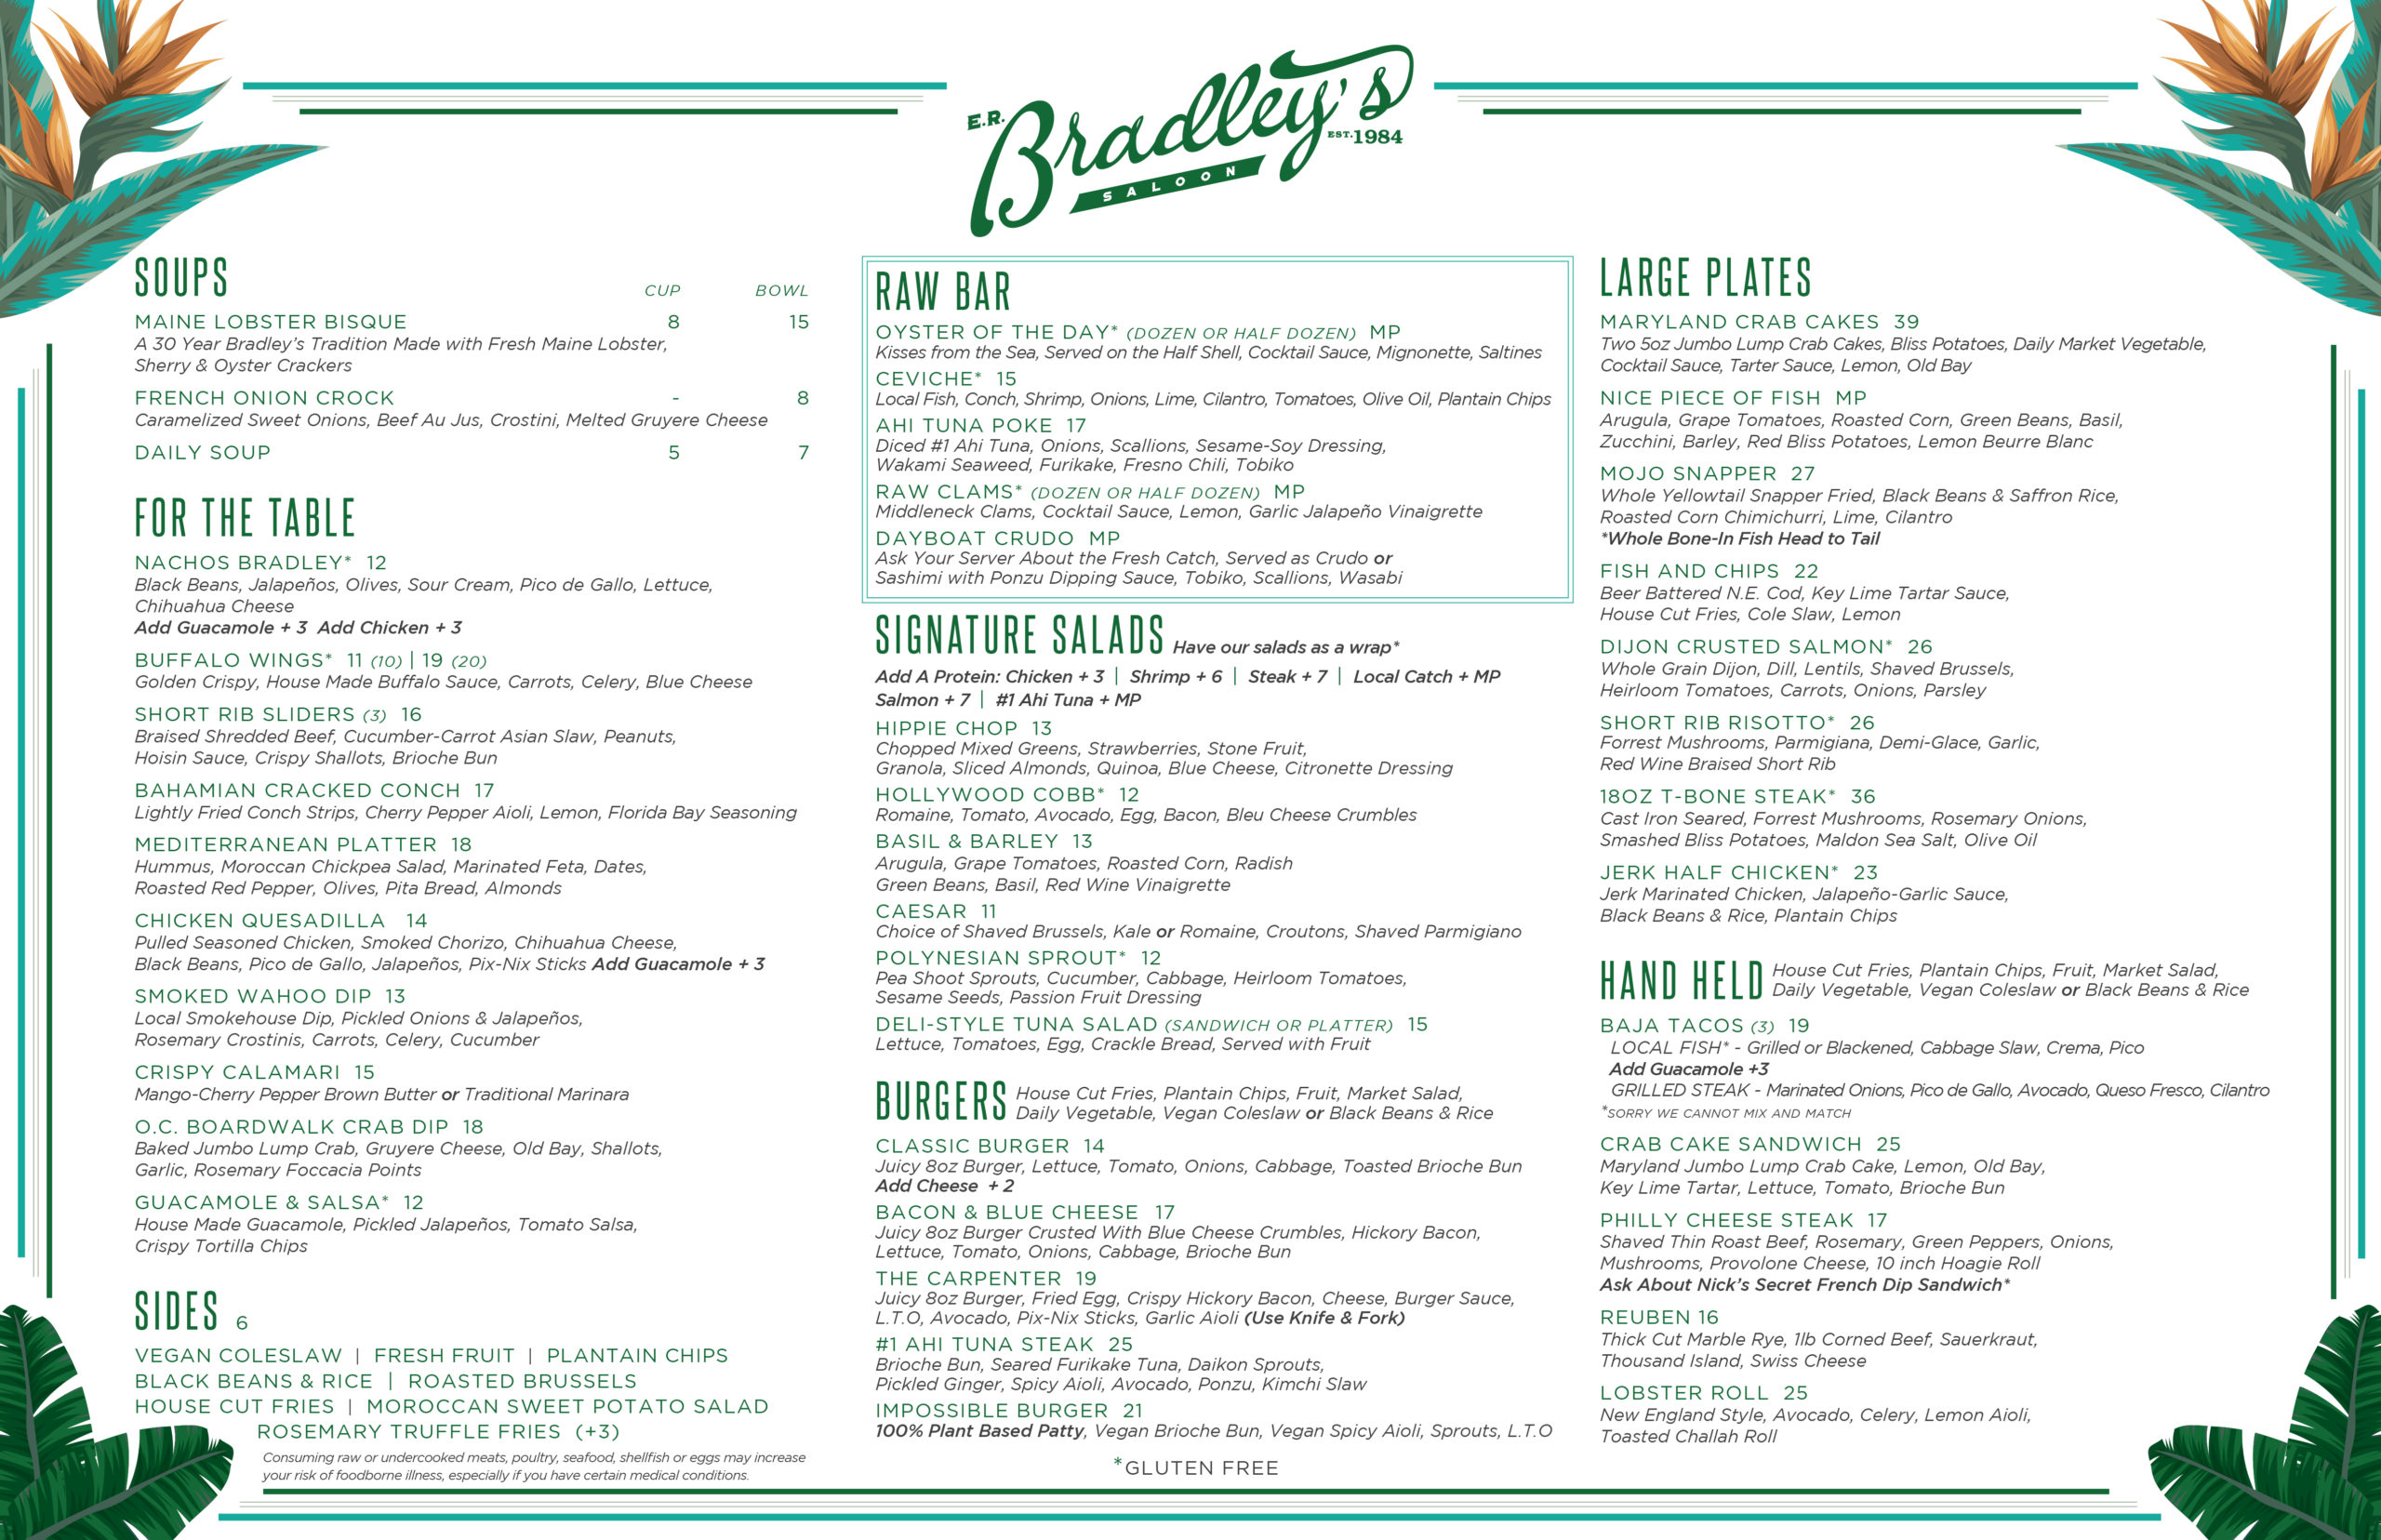 er bradleys menu designed by nicole david